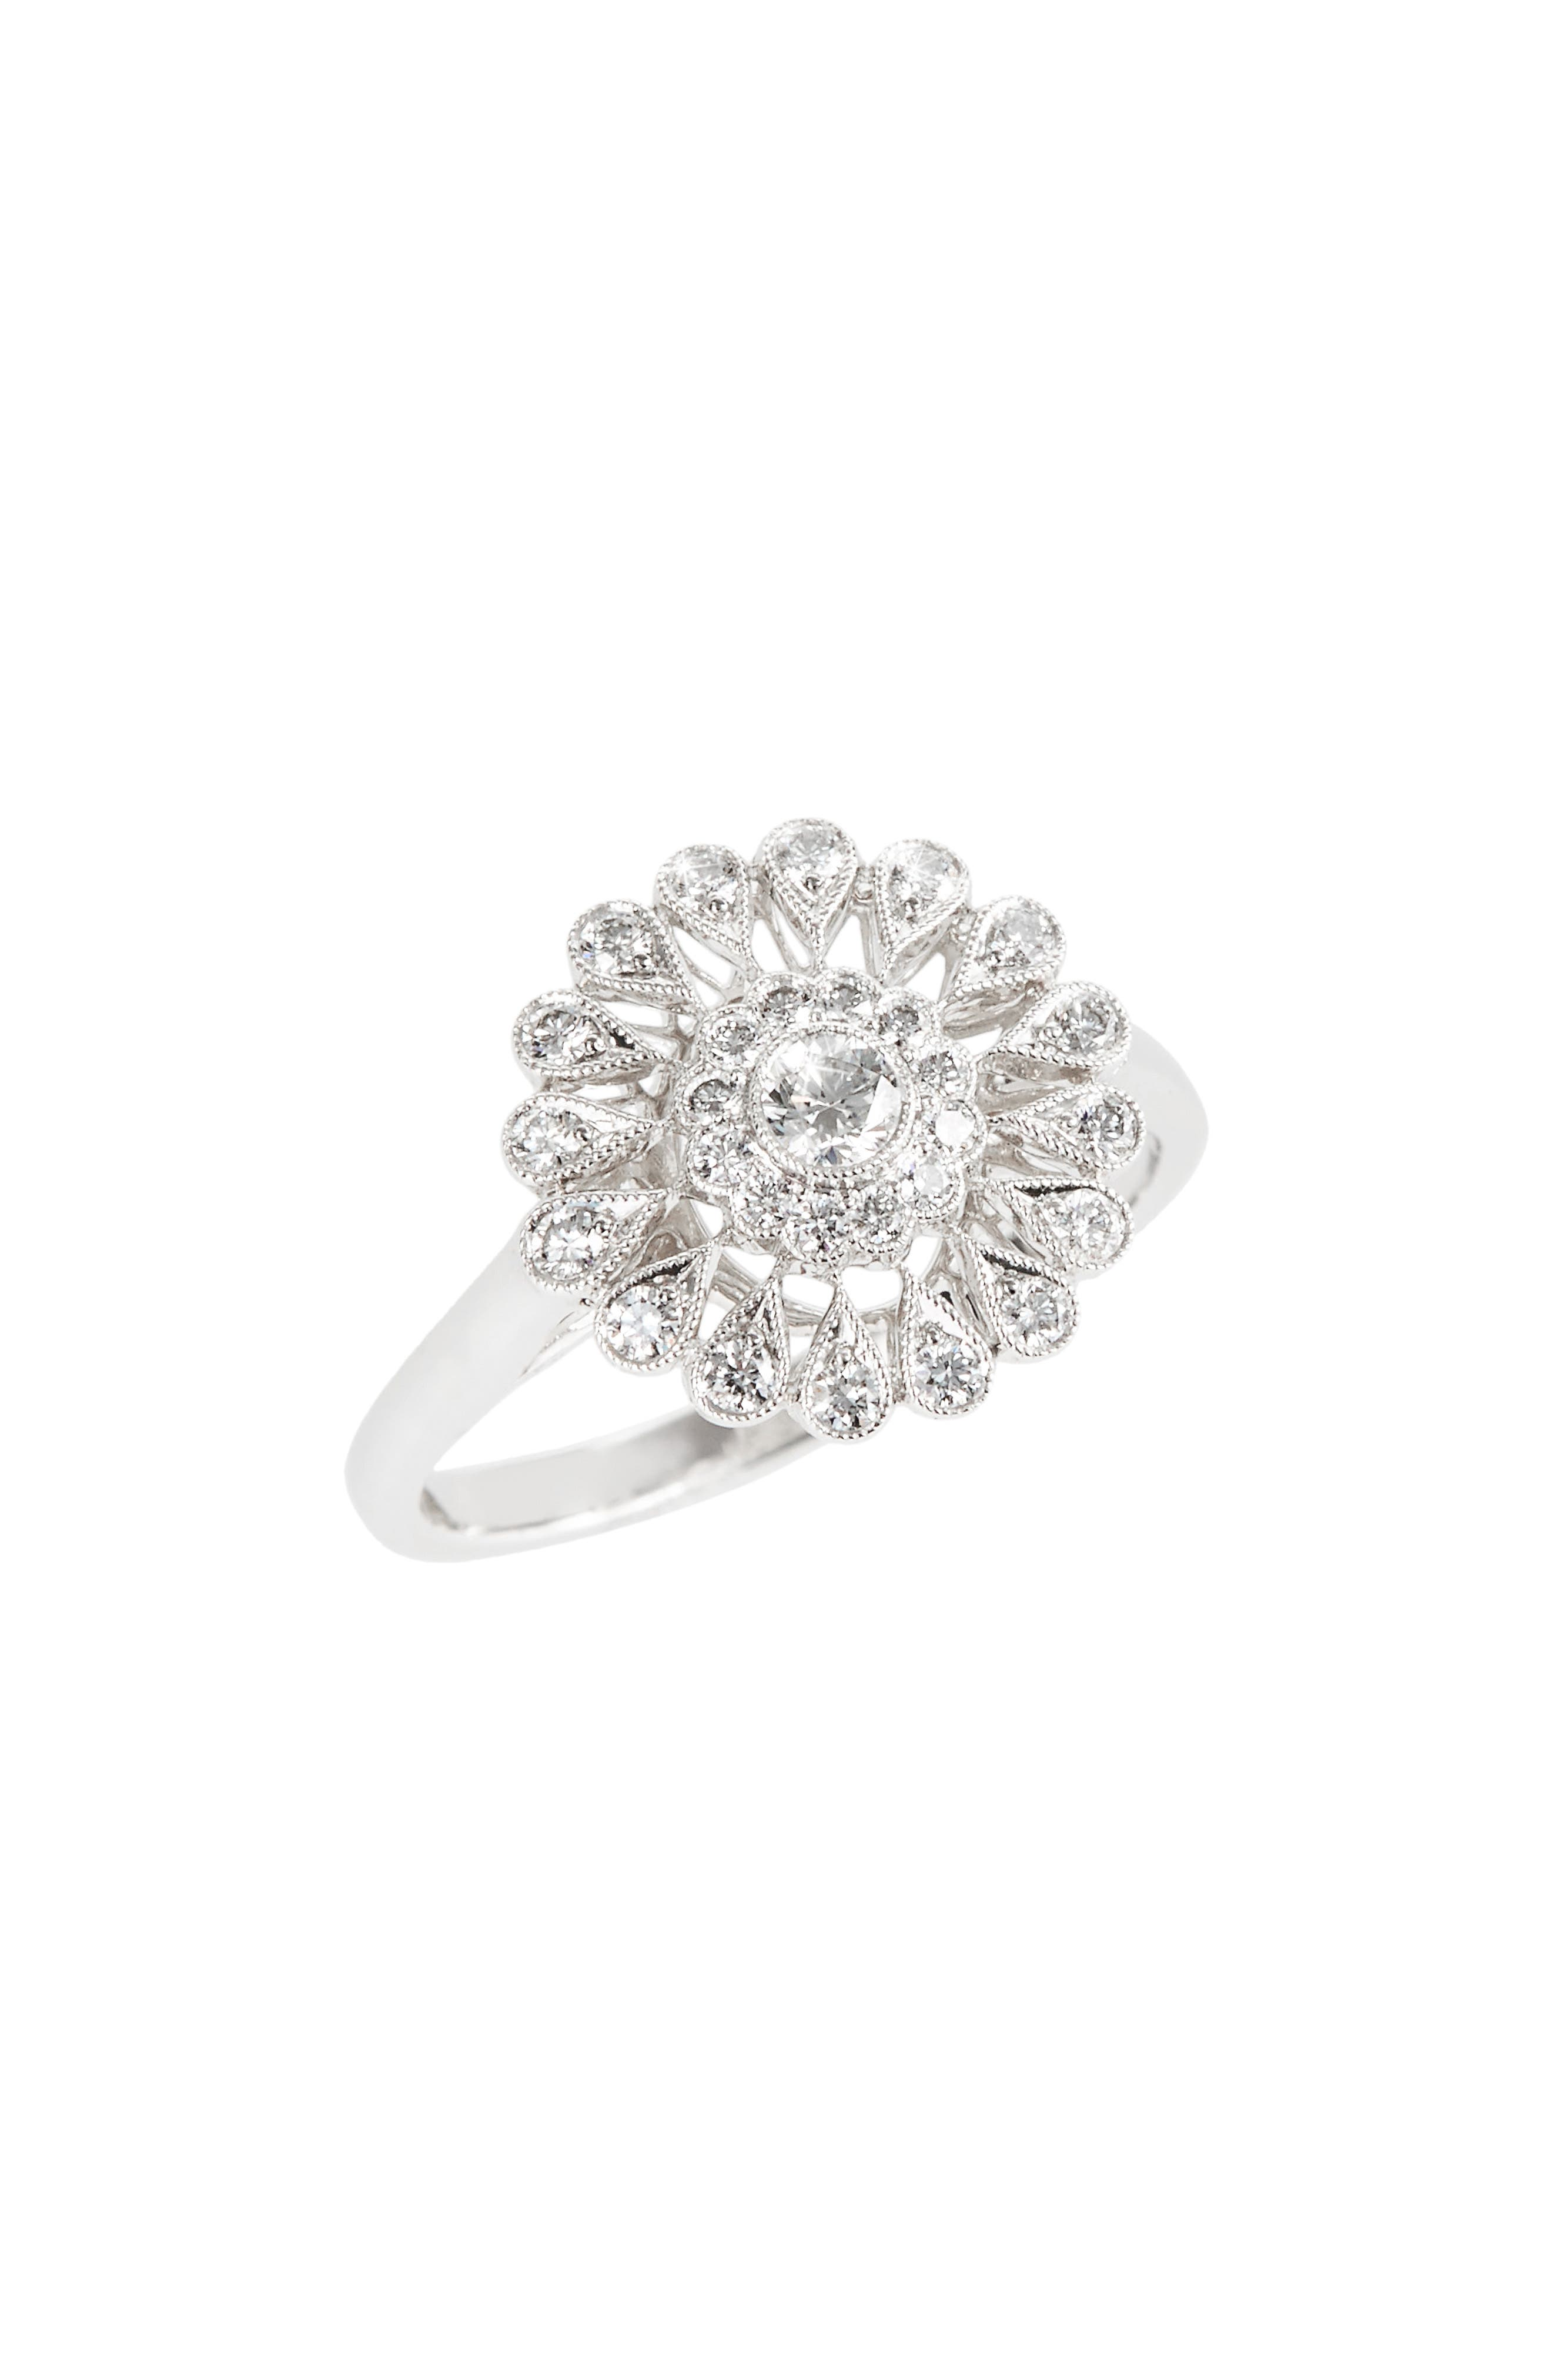 Main Image - Kwiat Vintage Flower Diamond Ring